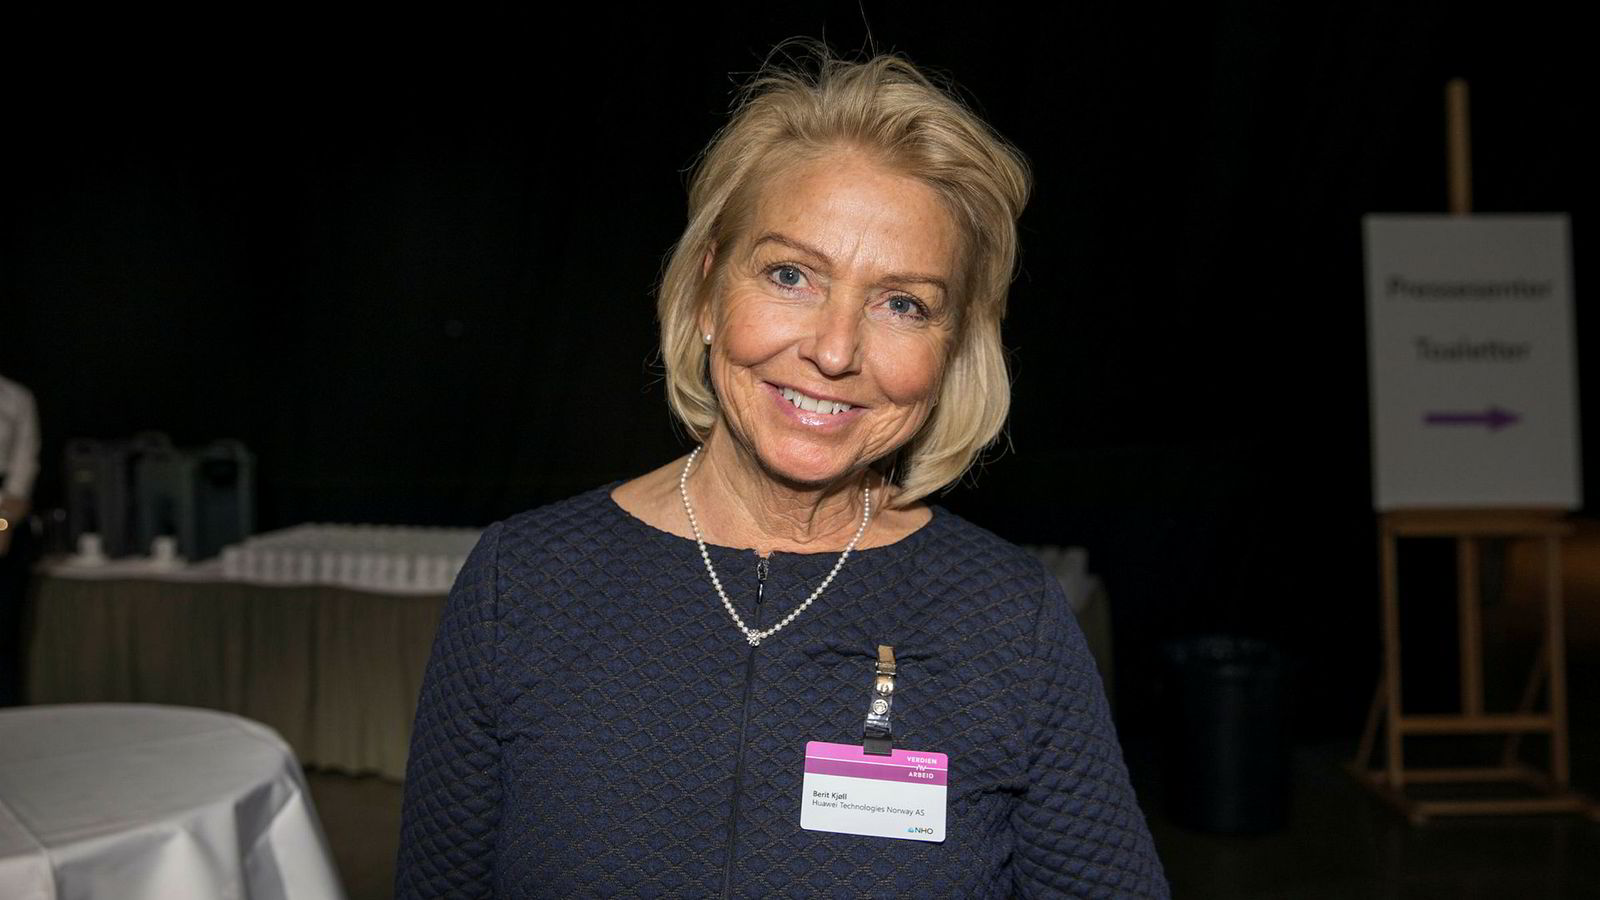 Direktør i Huawei, Berit Kjøll, under NHOs årskonferanse.